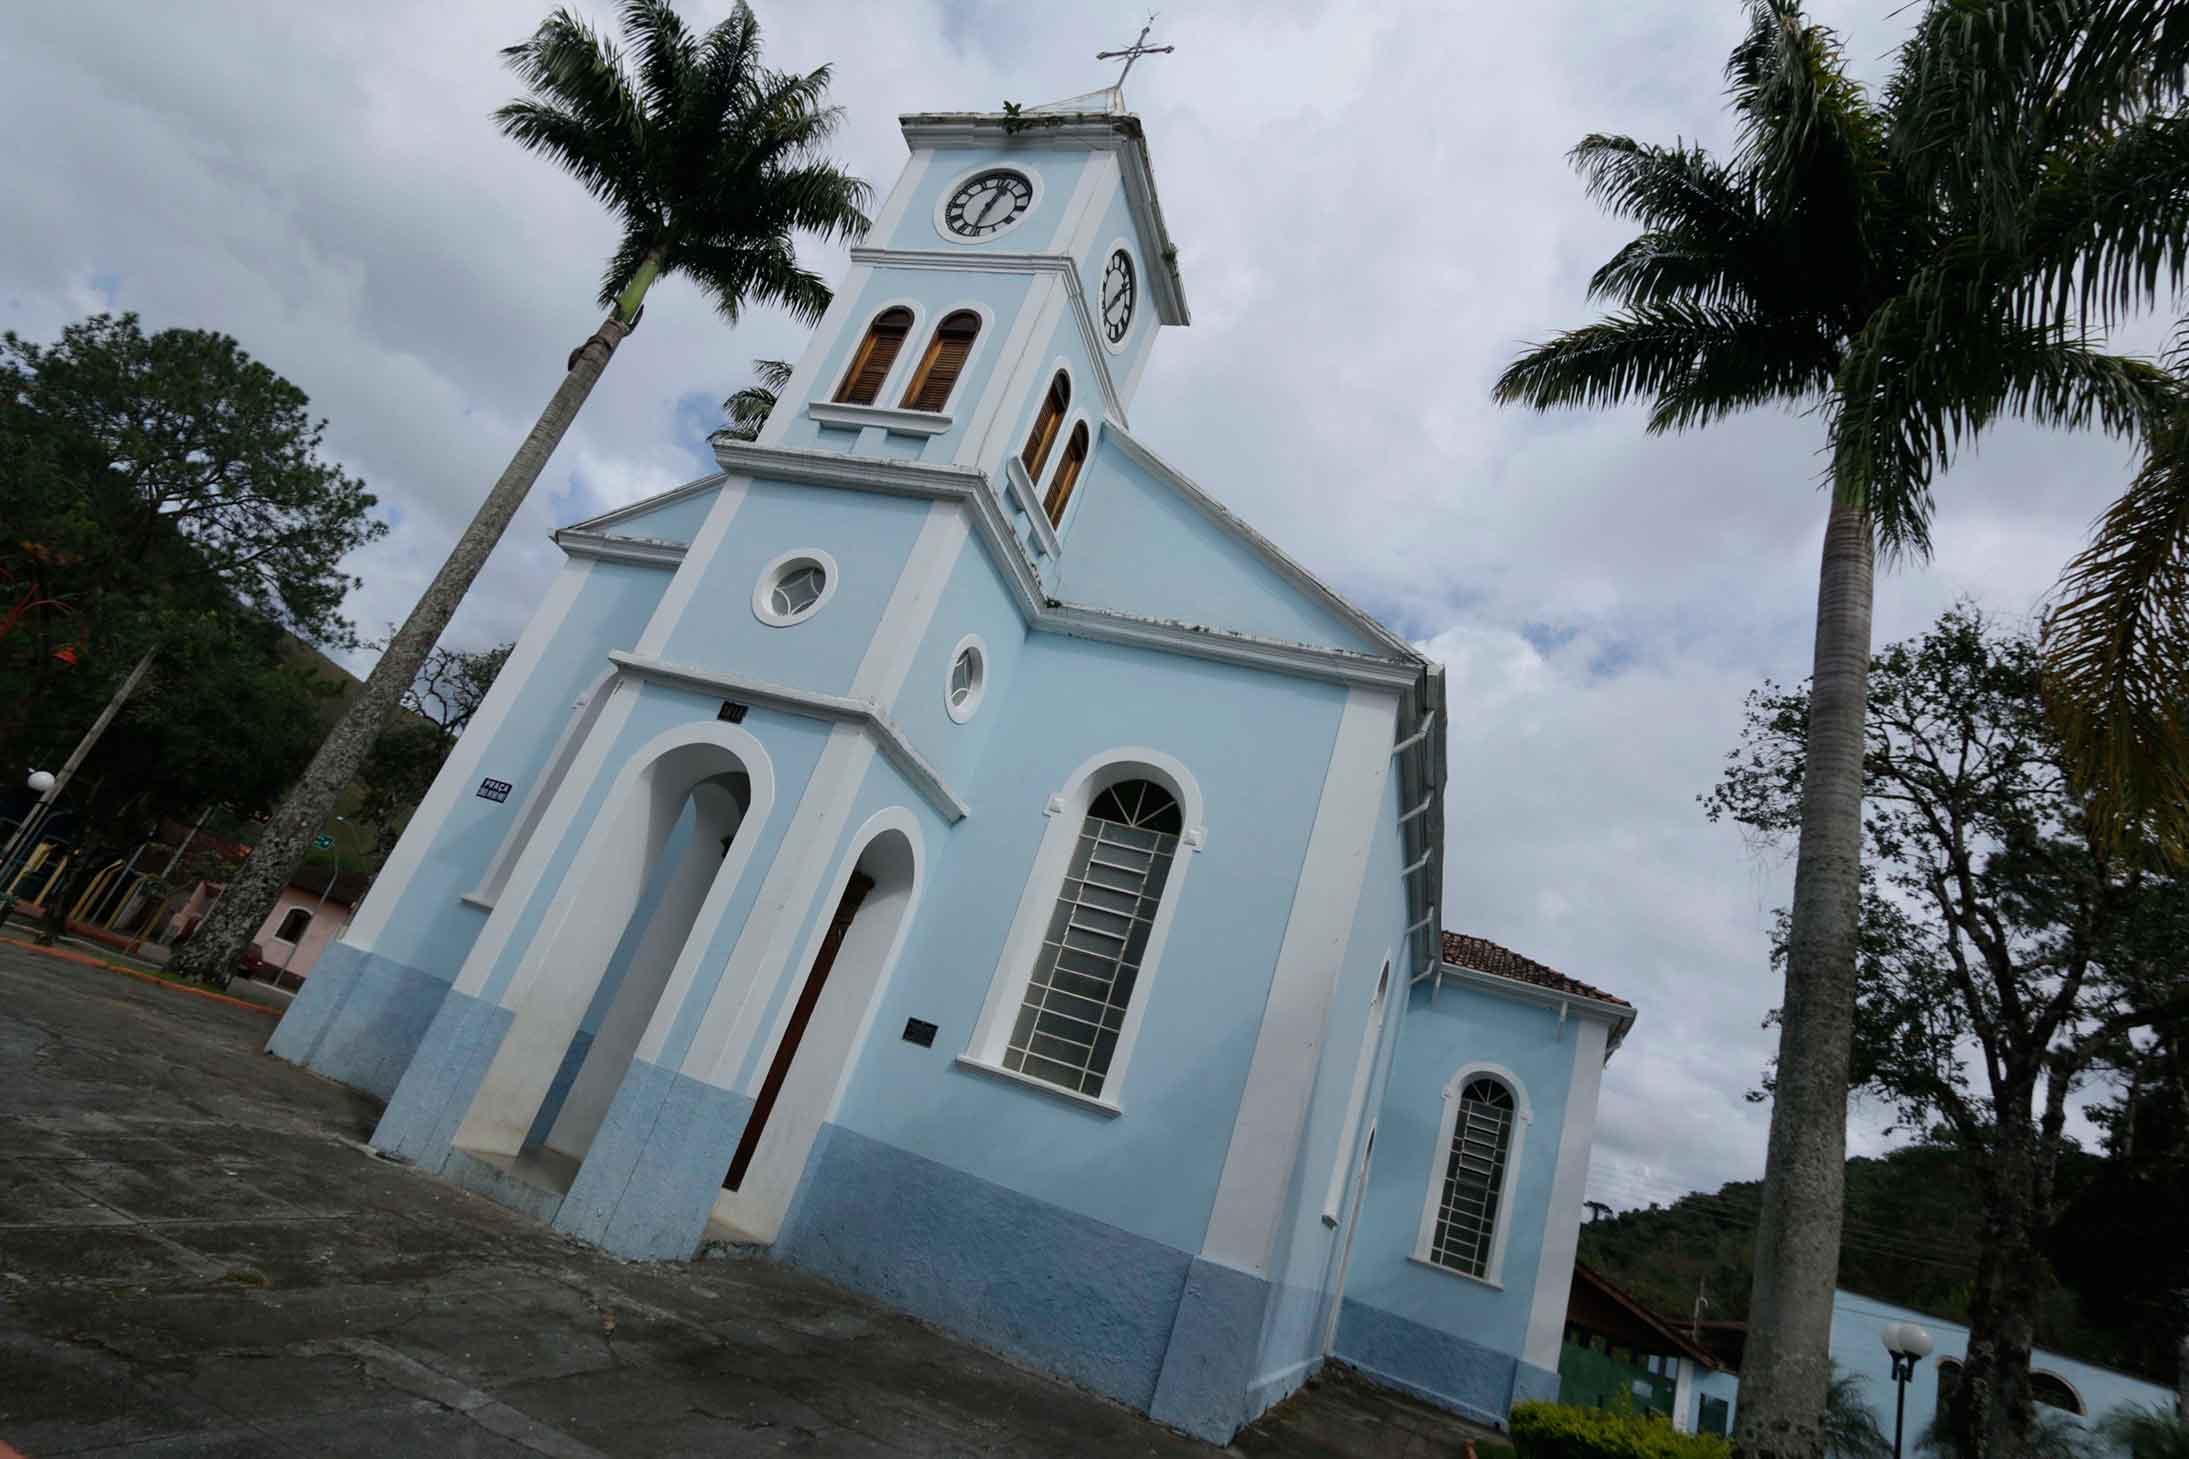 Sao-Francisco-Xavier-Turismo-Religioso-Igreja-Matriz-_MG_6381-bx